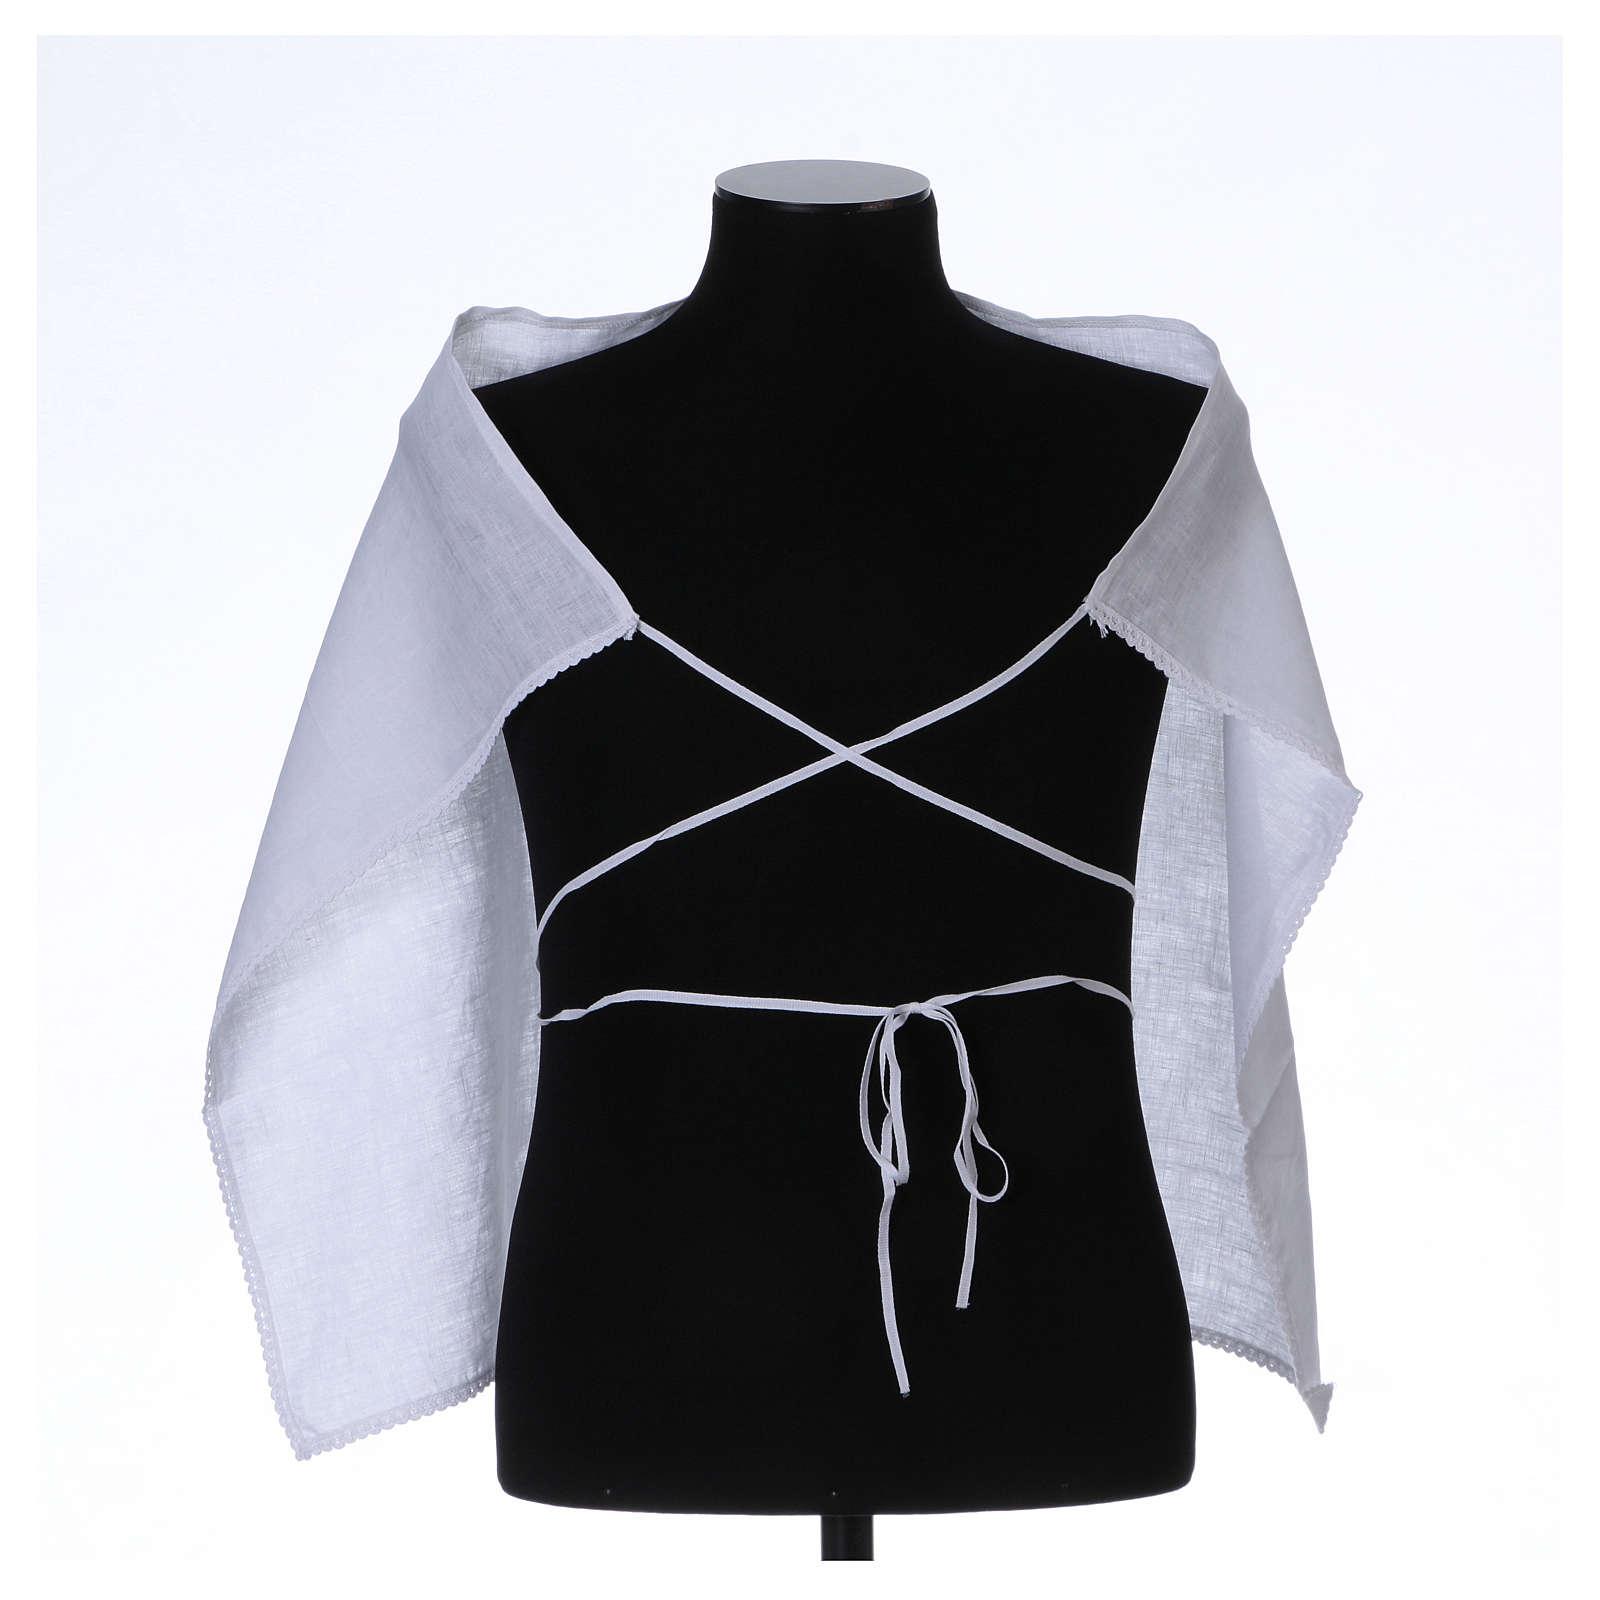 Amict blanc pur lin avec broderie croix IHS blanche 4